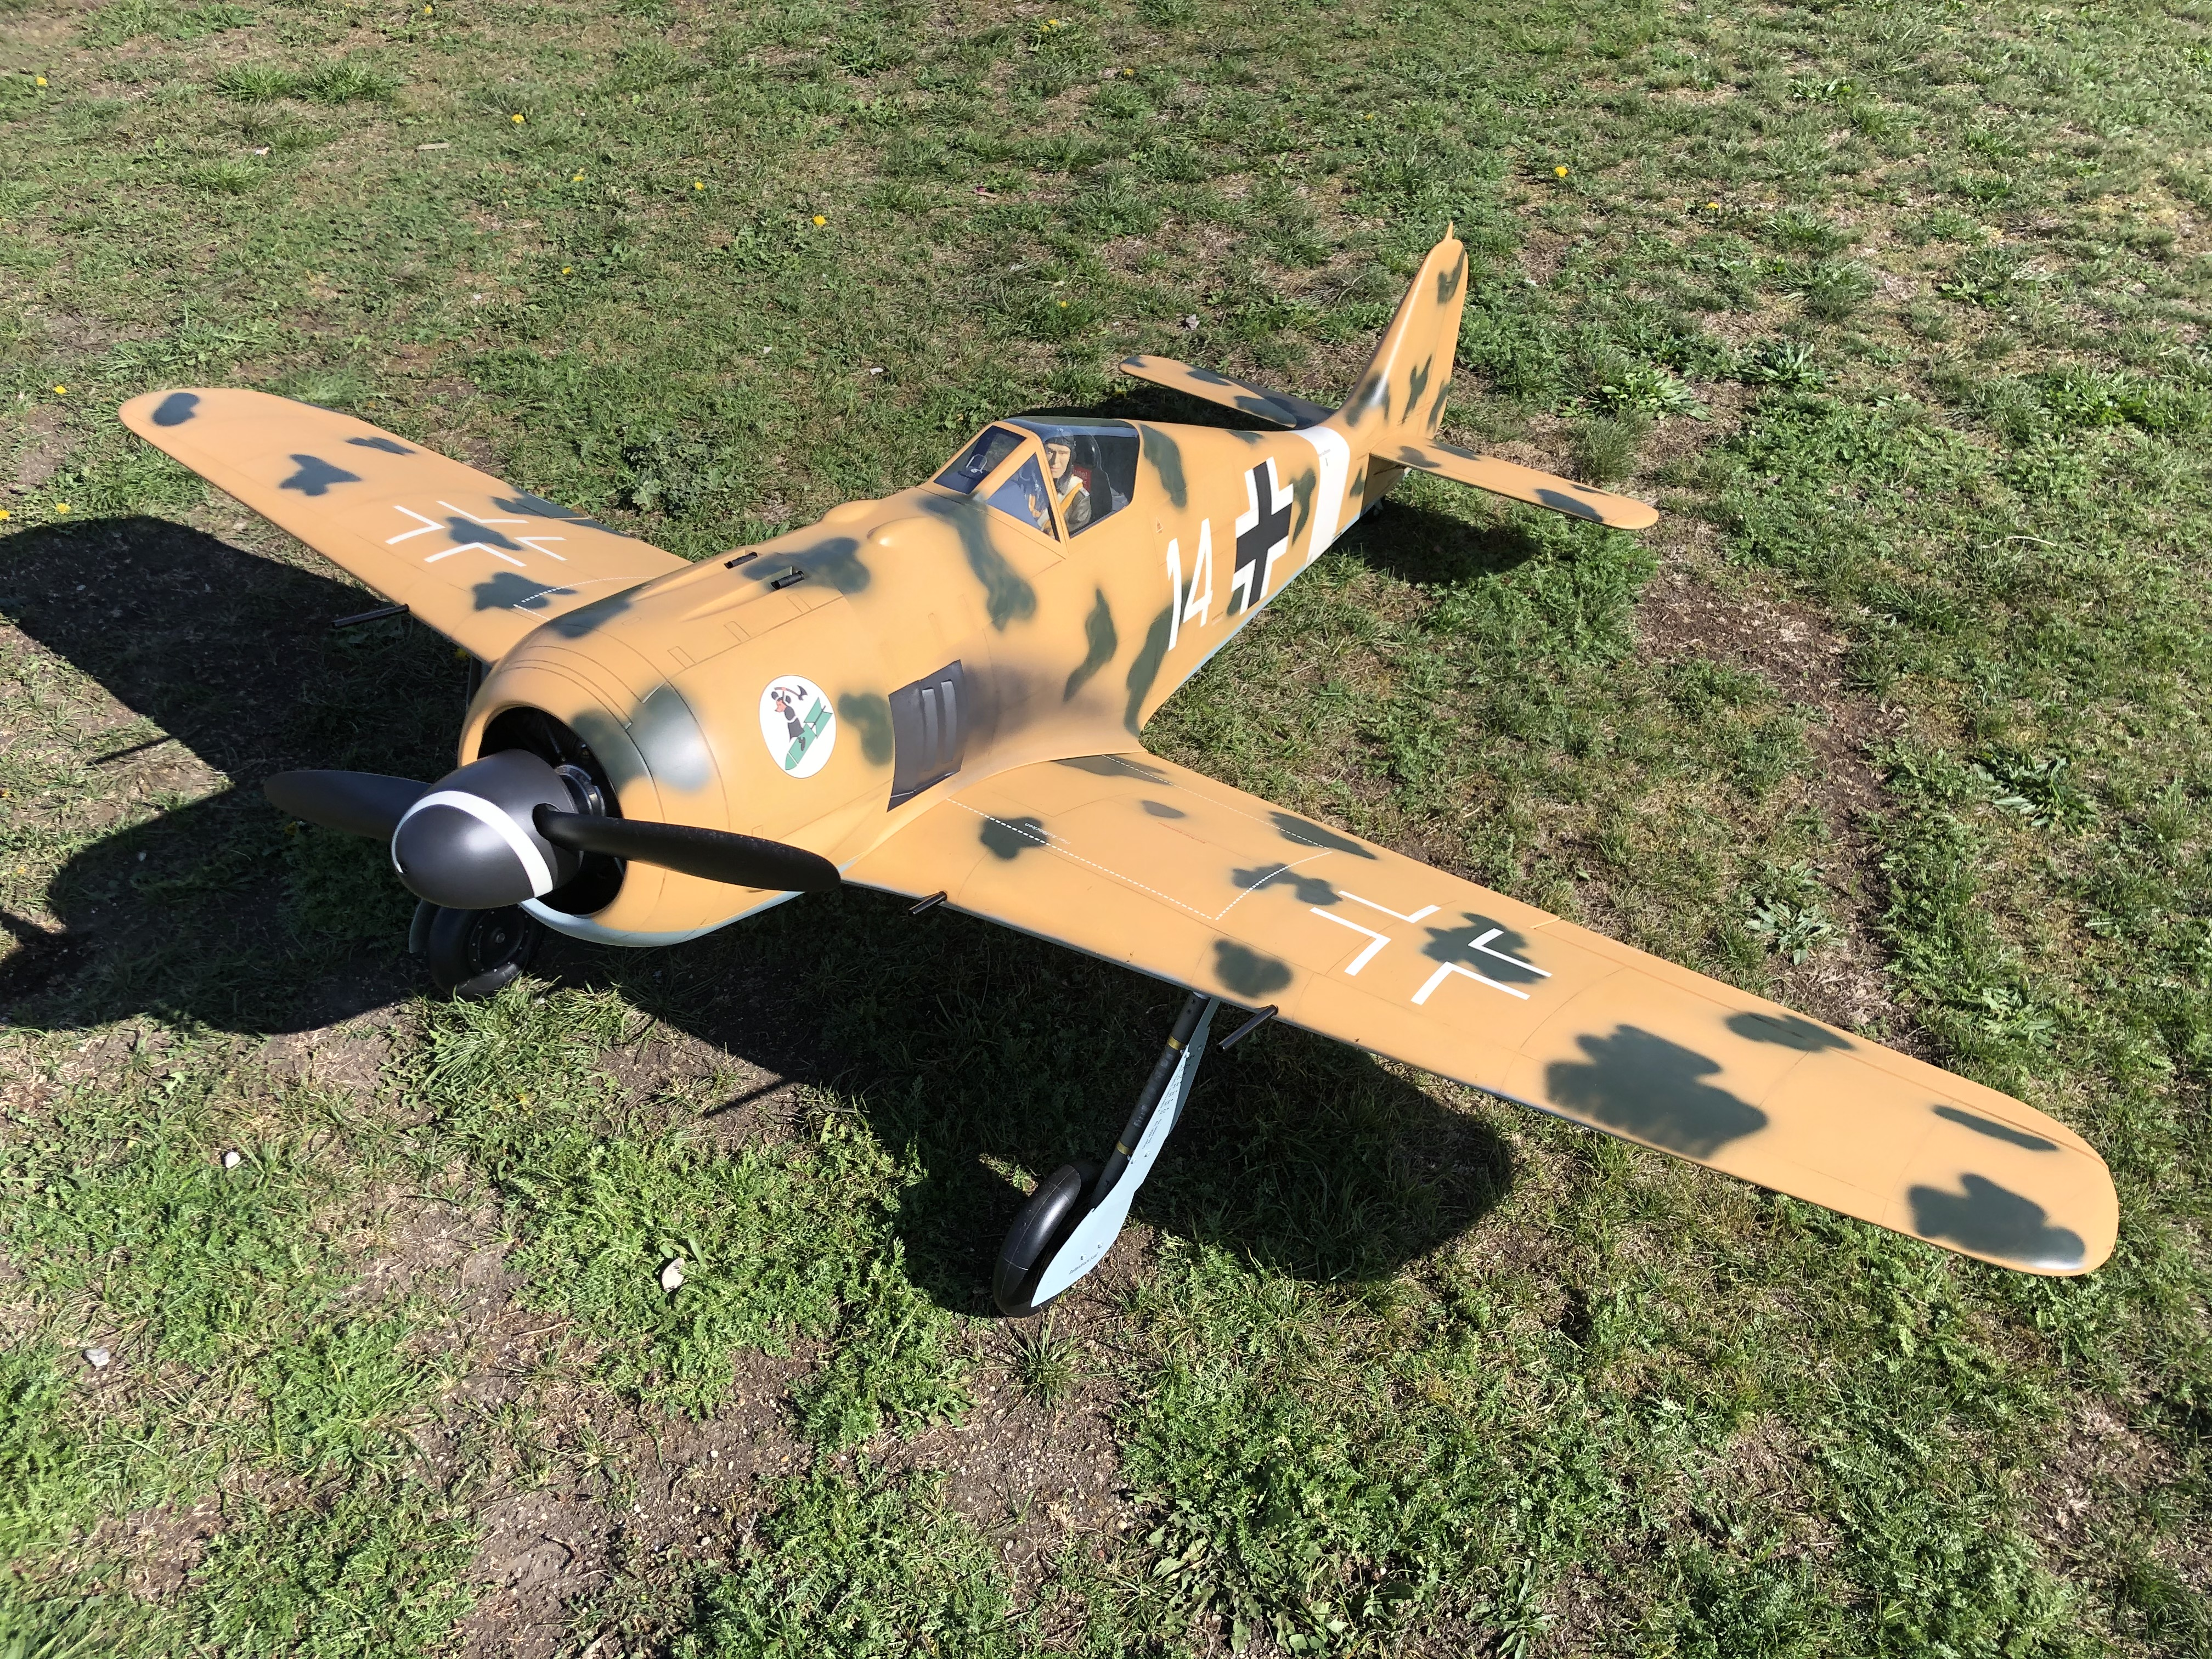 TopFlite FW190 - 2.16m - ST-100b